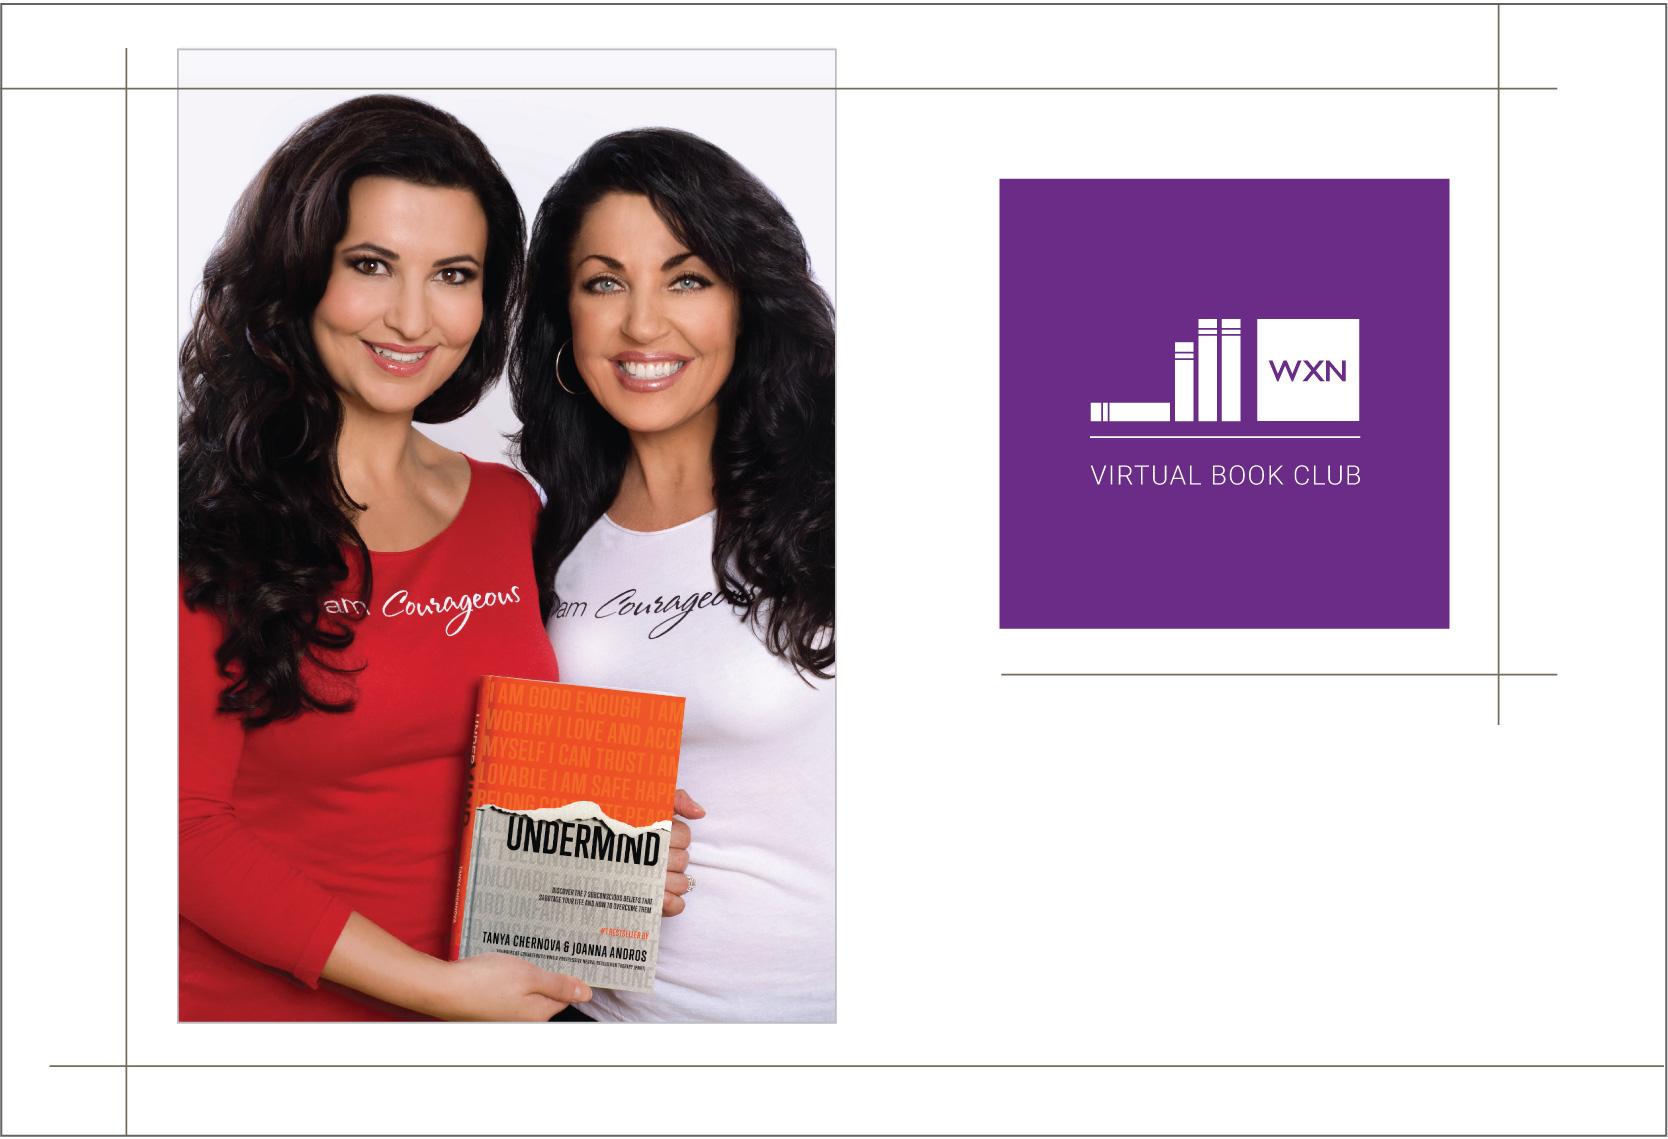 WXN Virtual Book Club featuring Tanya Chernova and Joanna Andros